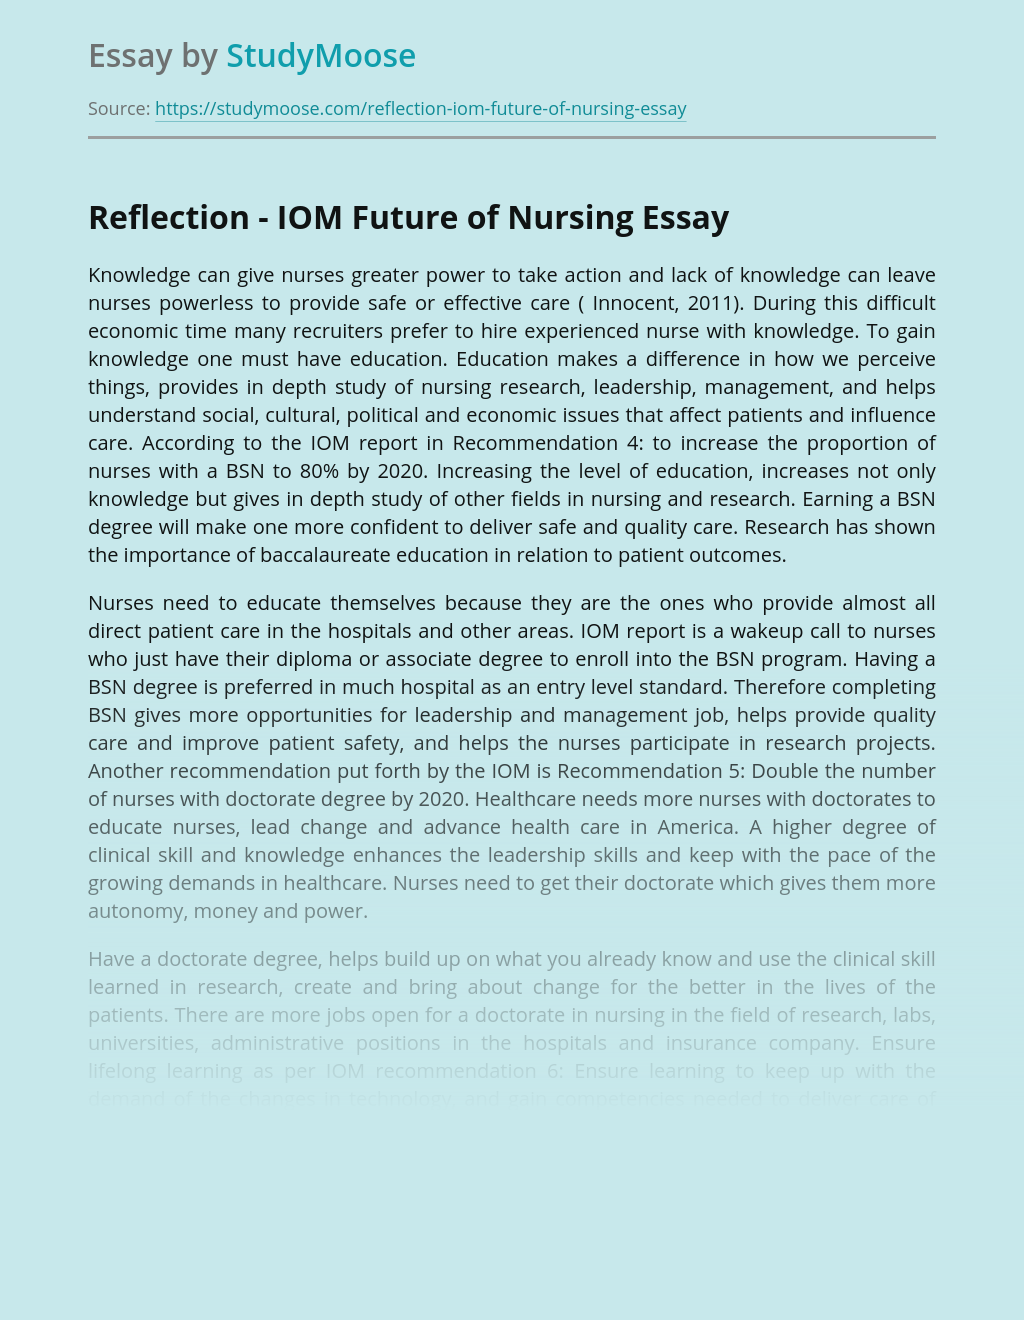 Reflection - IOM Future of Nursing